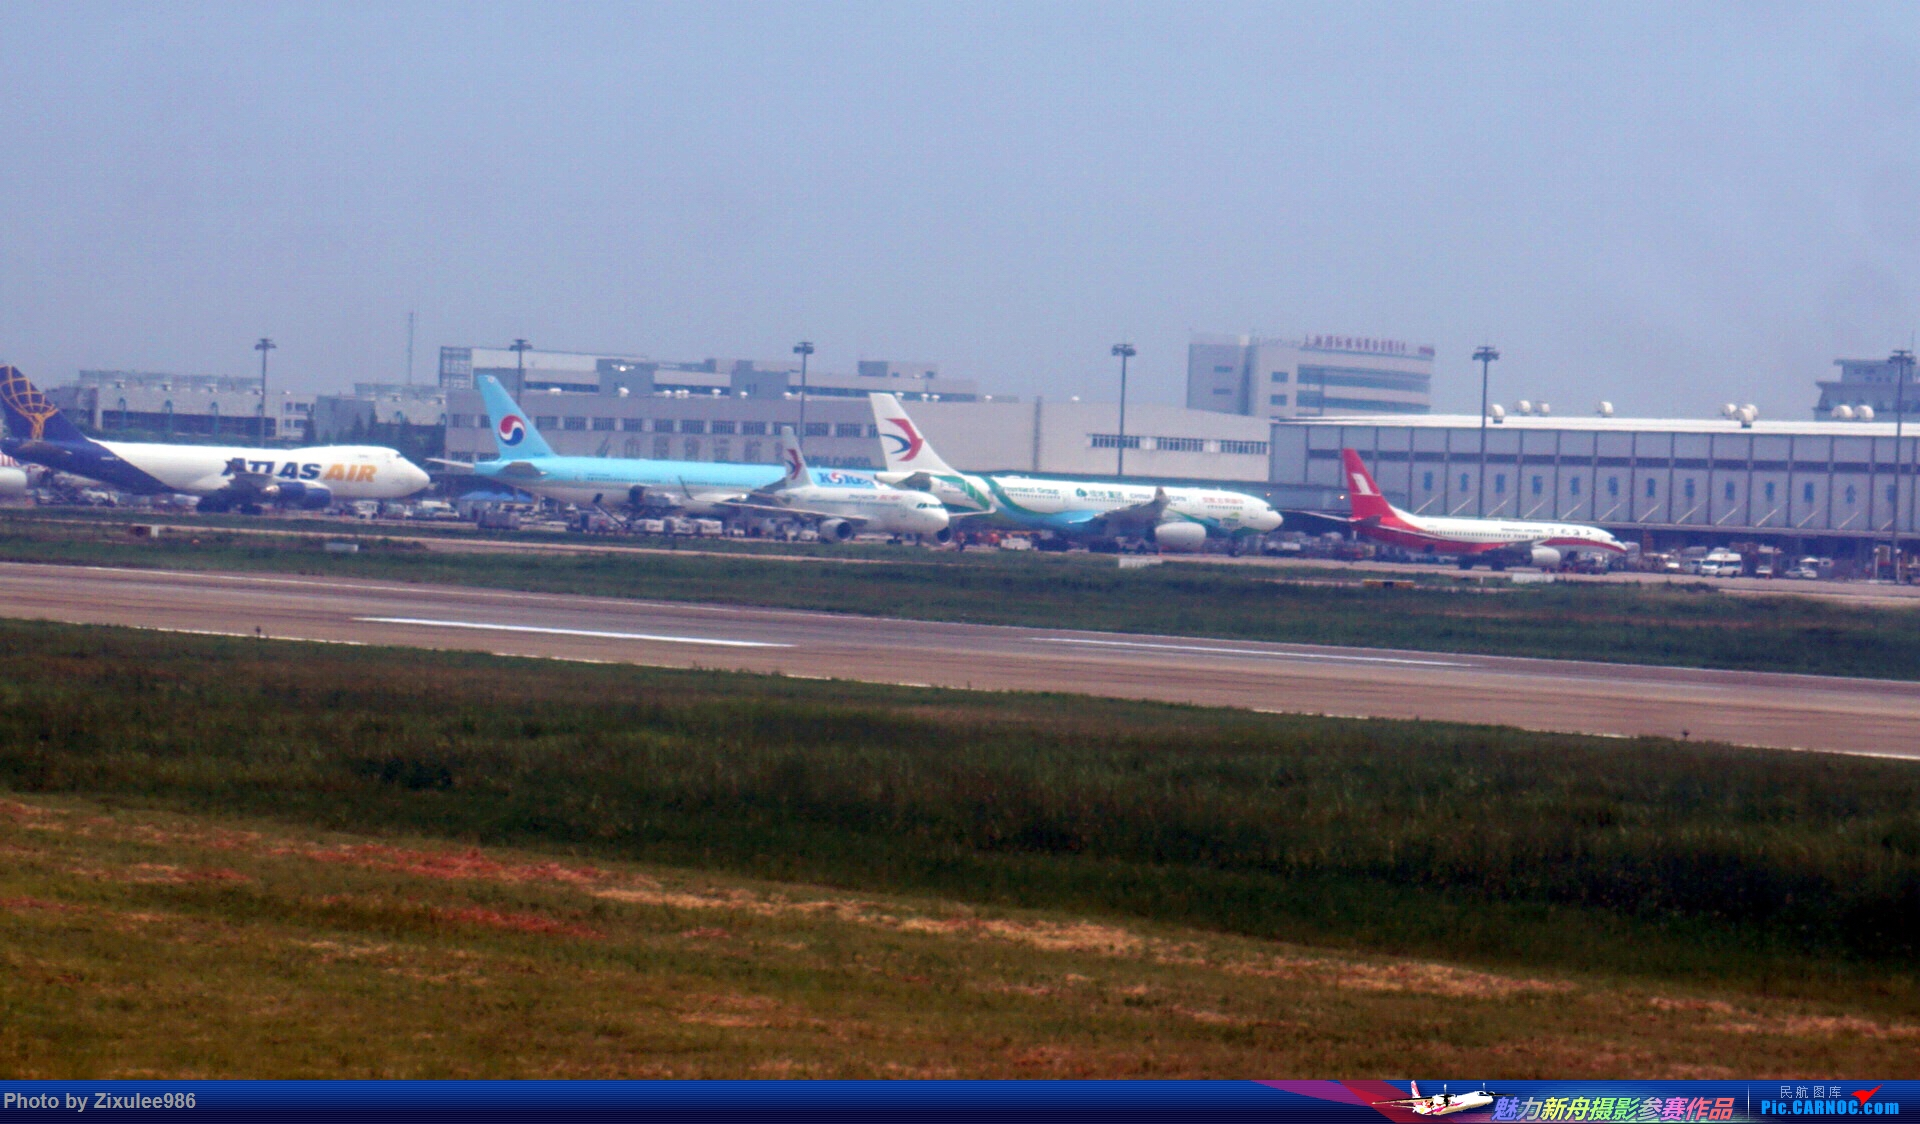 Re:[原创]加拿大21日游学之旅(一)~JJN-PVG-YYZ..(内含flightlog)~第一次发游记~多图缓更请谅解 AIRBUS A330-200 B-5902 中国上海浦东国际机场